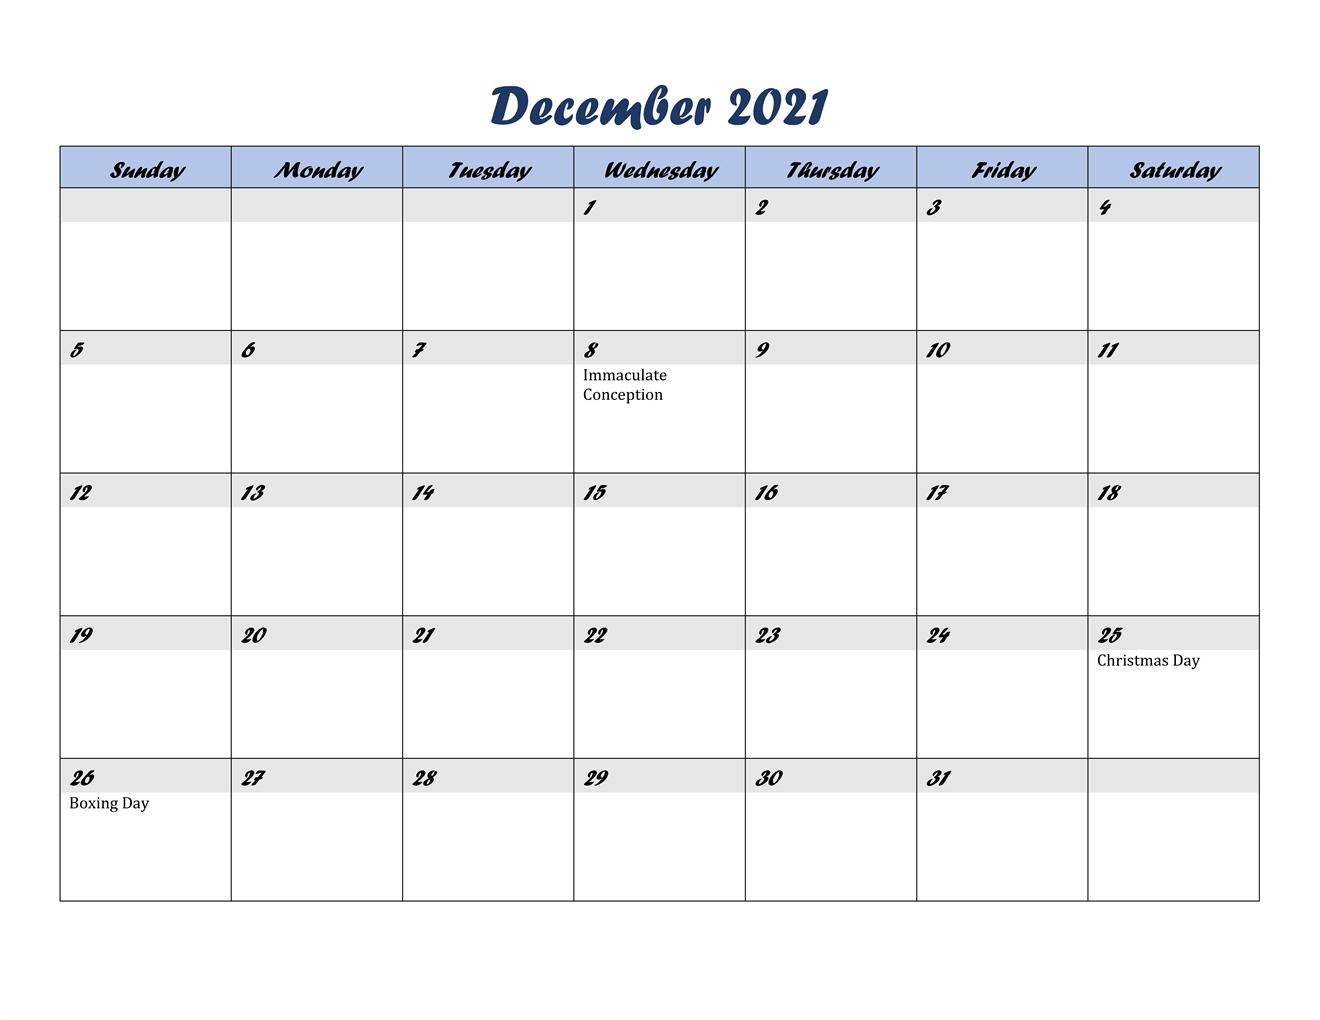 December Calendar 2021 With Holidays India